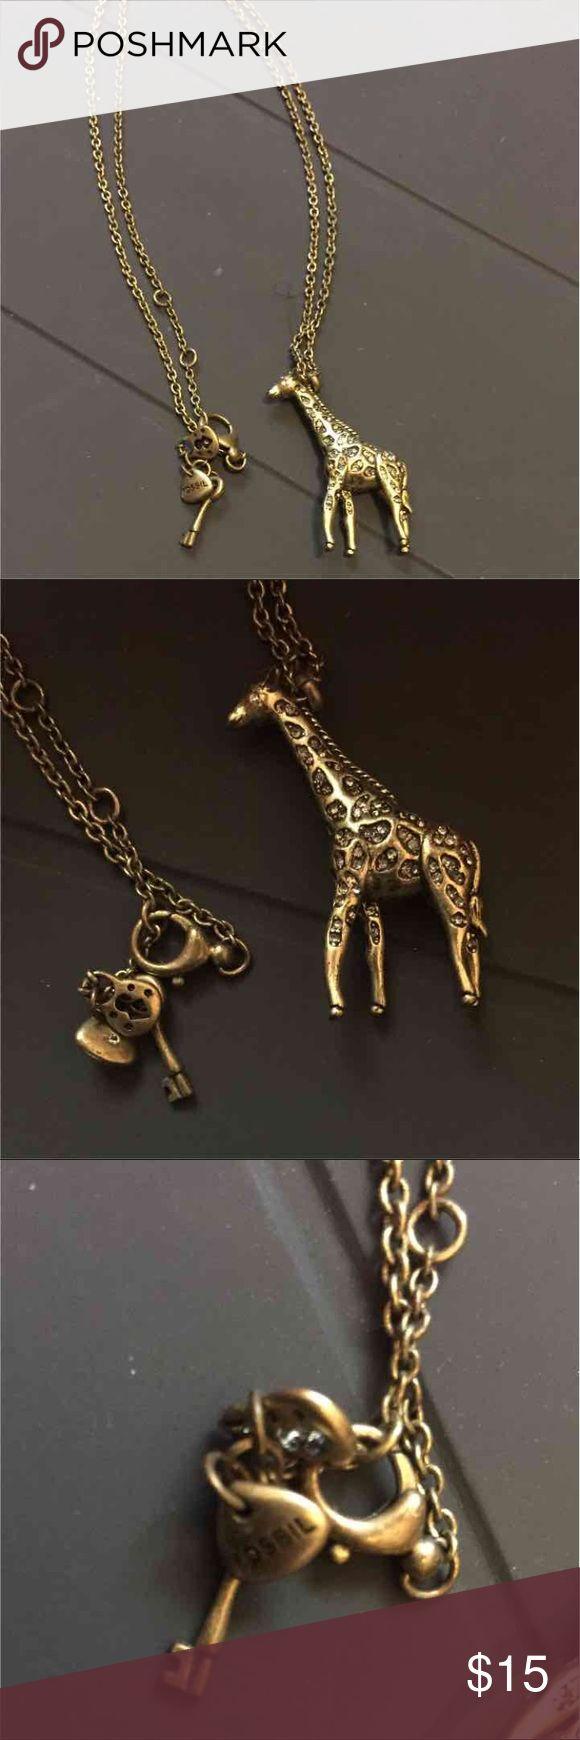 Fossil Giraffe Necklace Super cute Piece Fossil Jewelry Necklaces